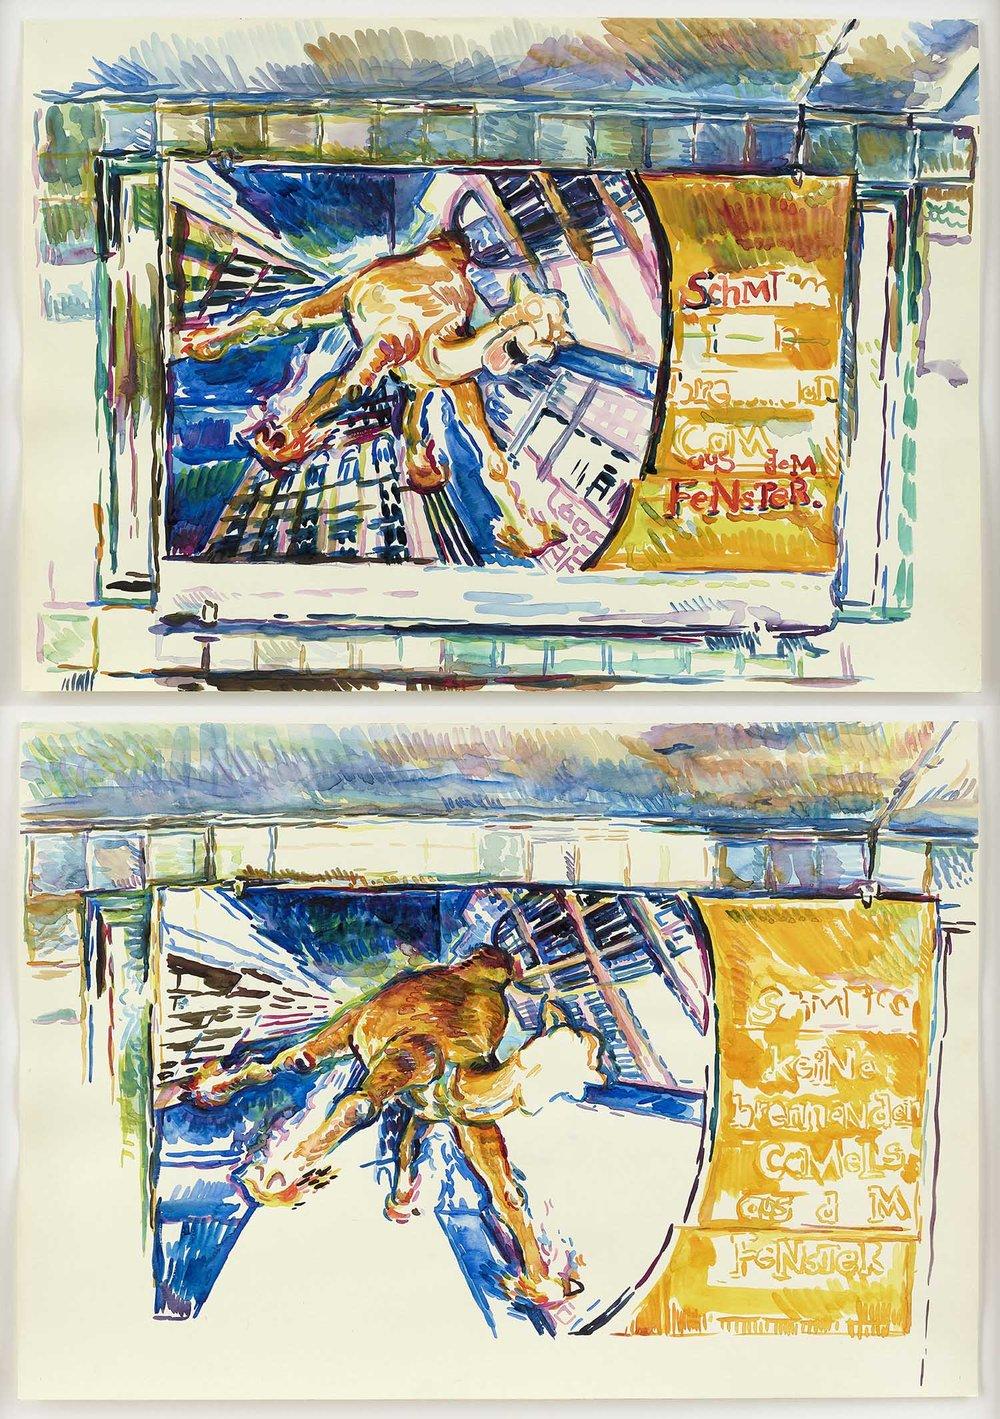 o.T. | 9./13.11.2000 und 11., 16. & 18.11.2000 (Moritzplatz/ Berlin) | zwei Aquarelle auf Papier | je 42 x 59 cm (gerahmt: 96 x 69 cm)